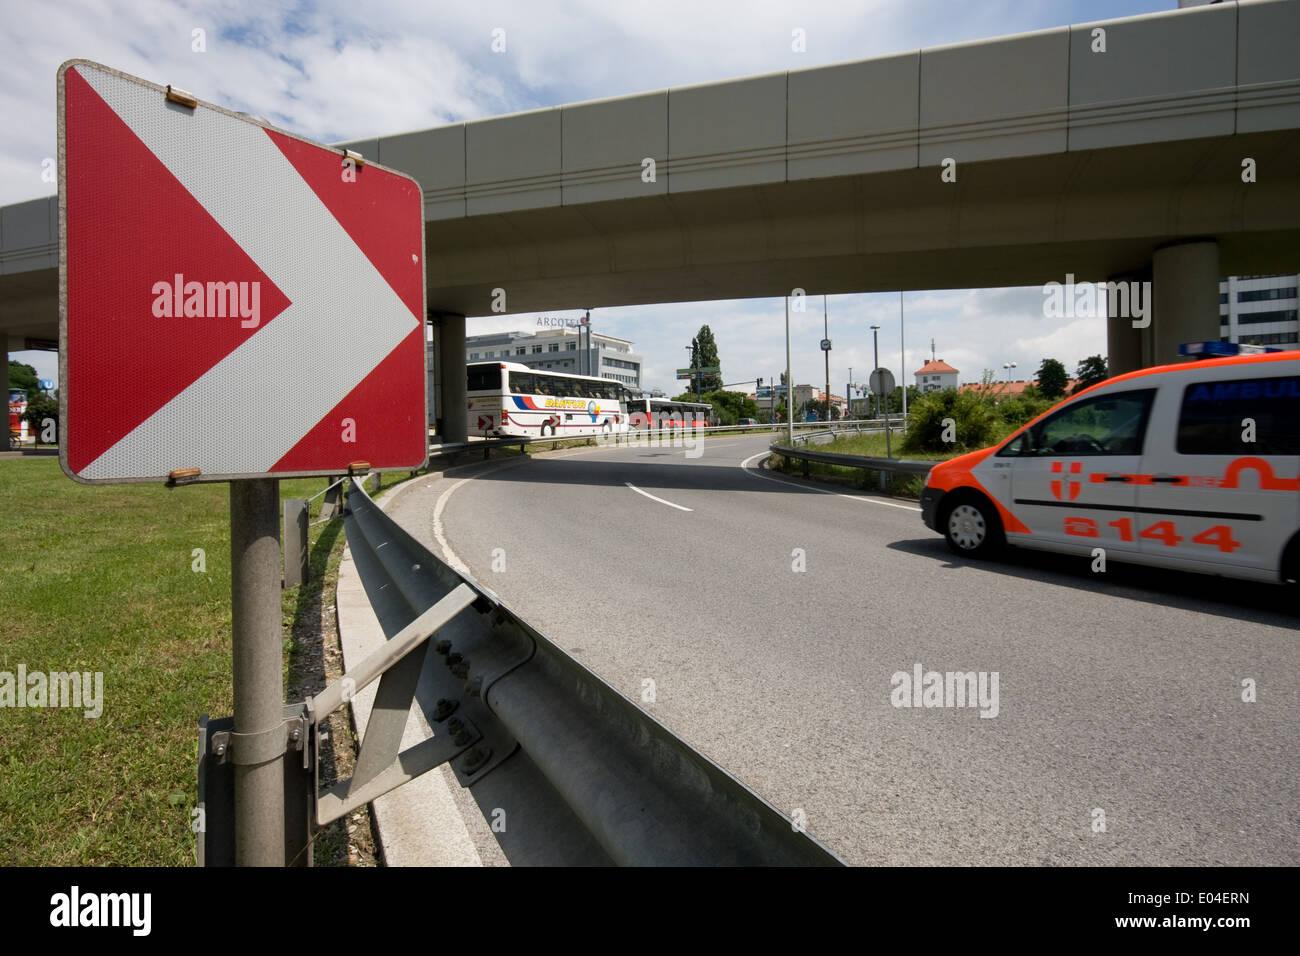 Traffic, Ambulance, Strassenverkehr, Rettung - Stock Image